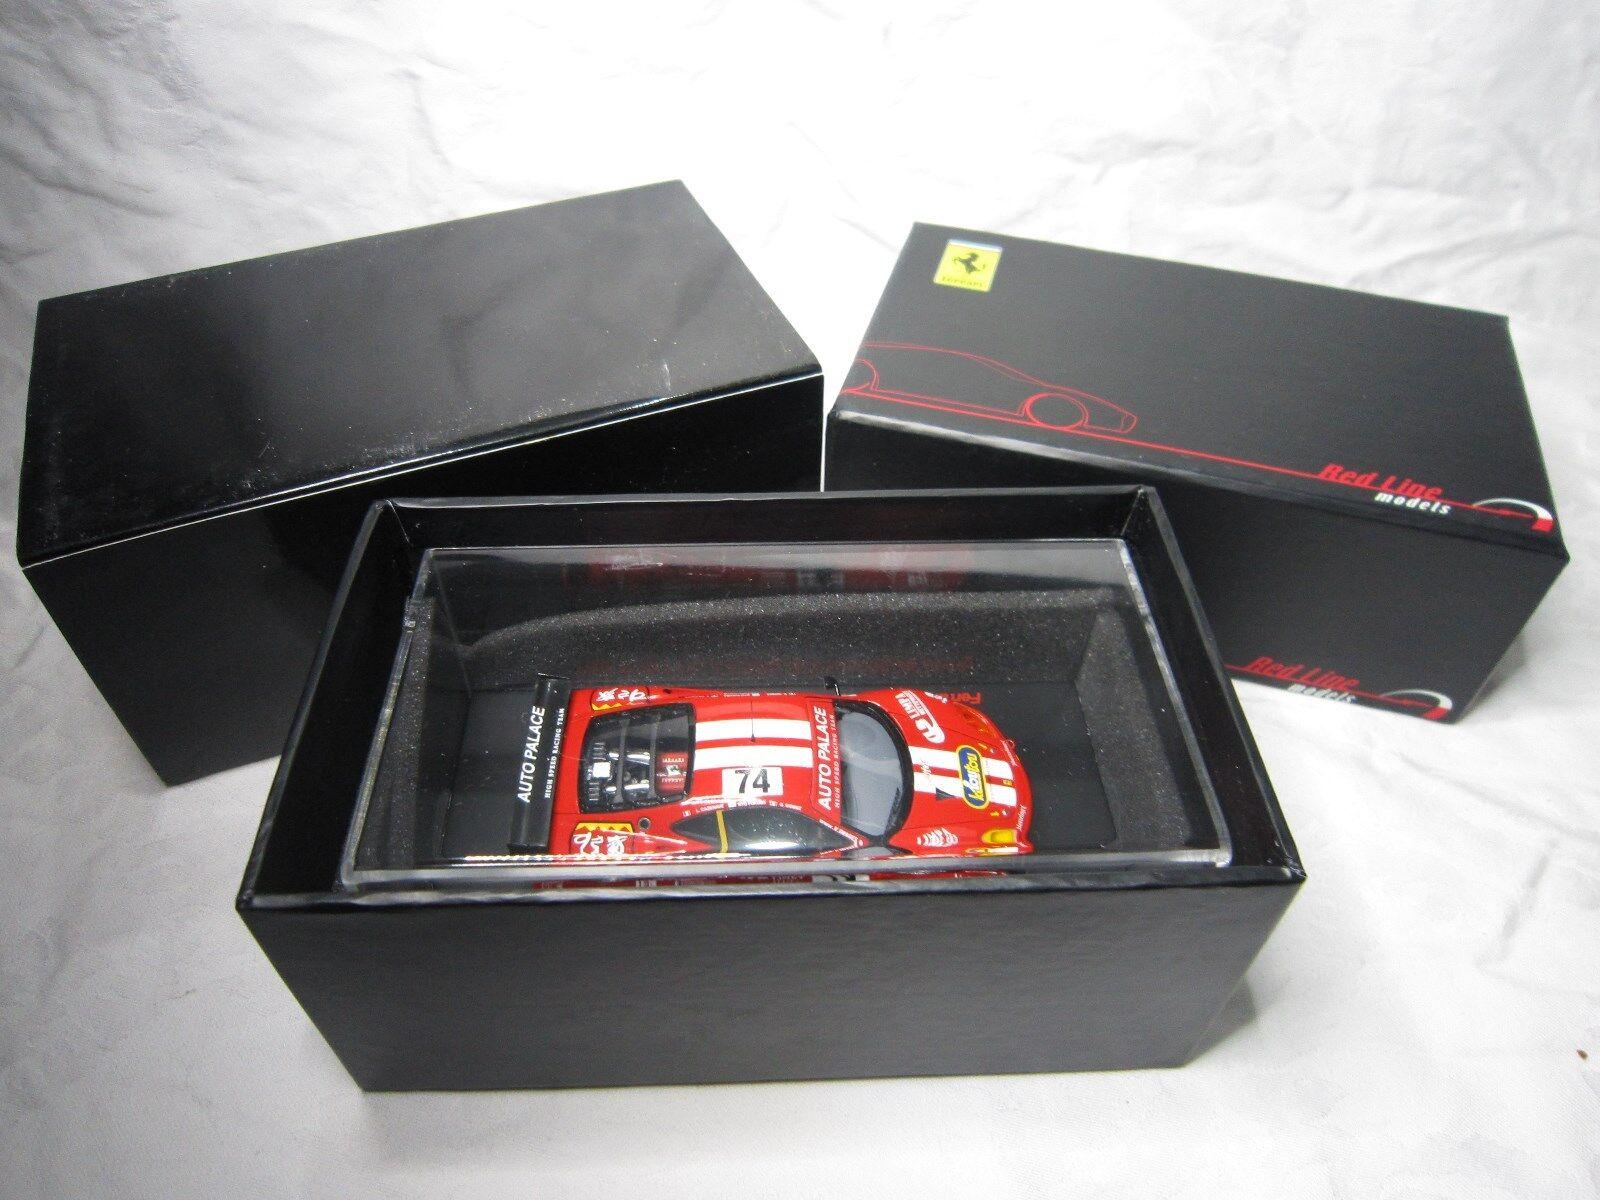 DV7204 RED LINE MODELS 1/43 FERRARI 360 MODENA AUTO PALACE #74 MANS 2002 RL003